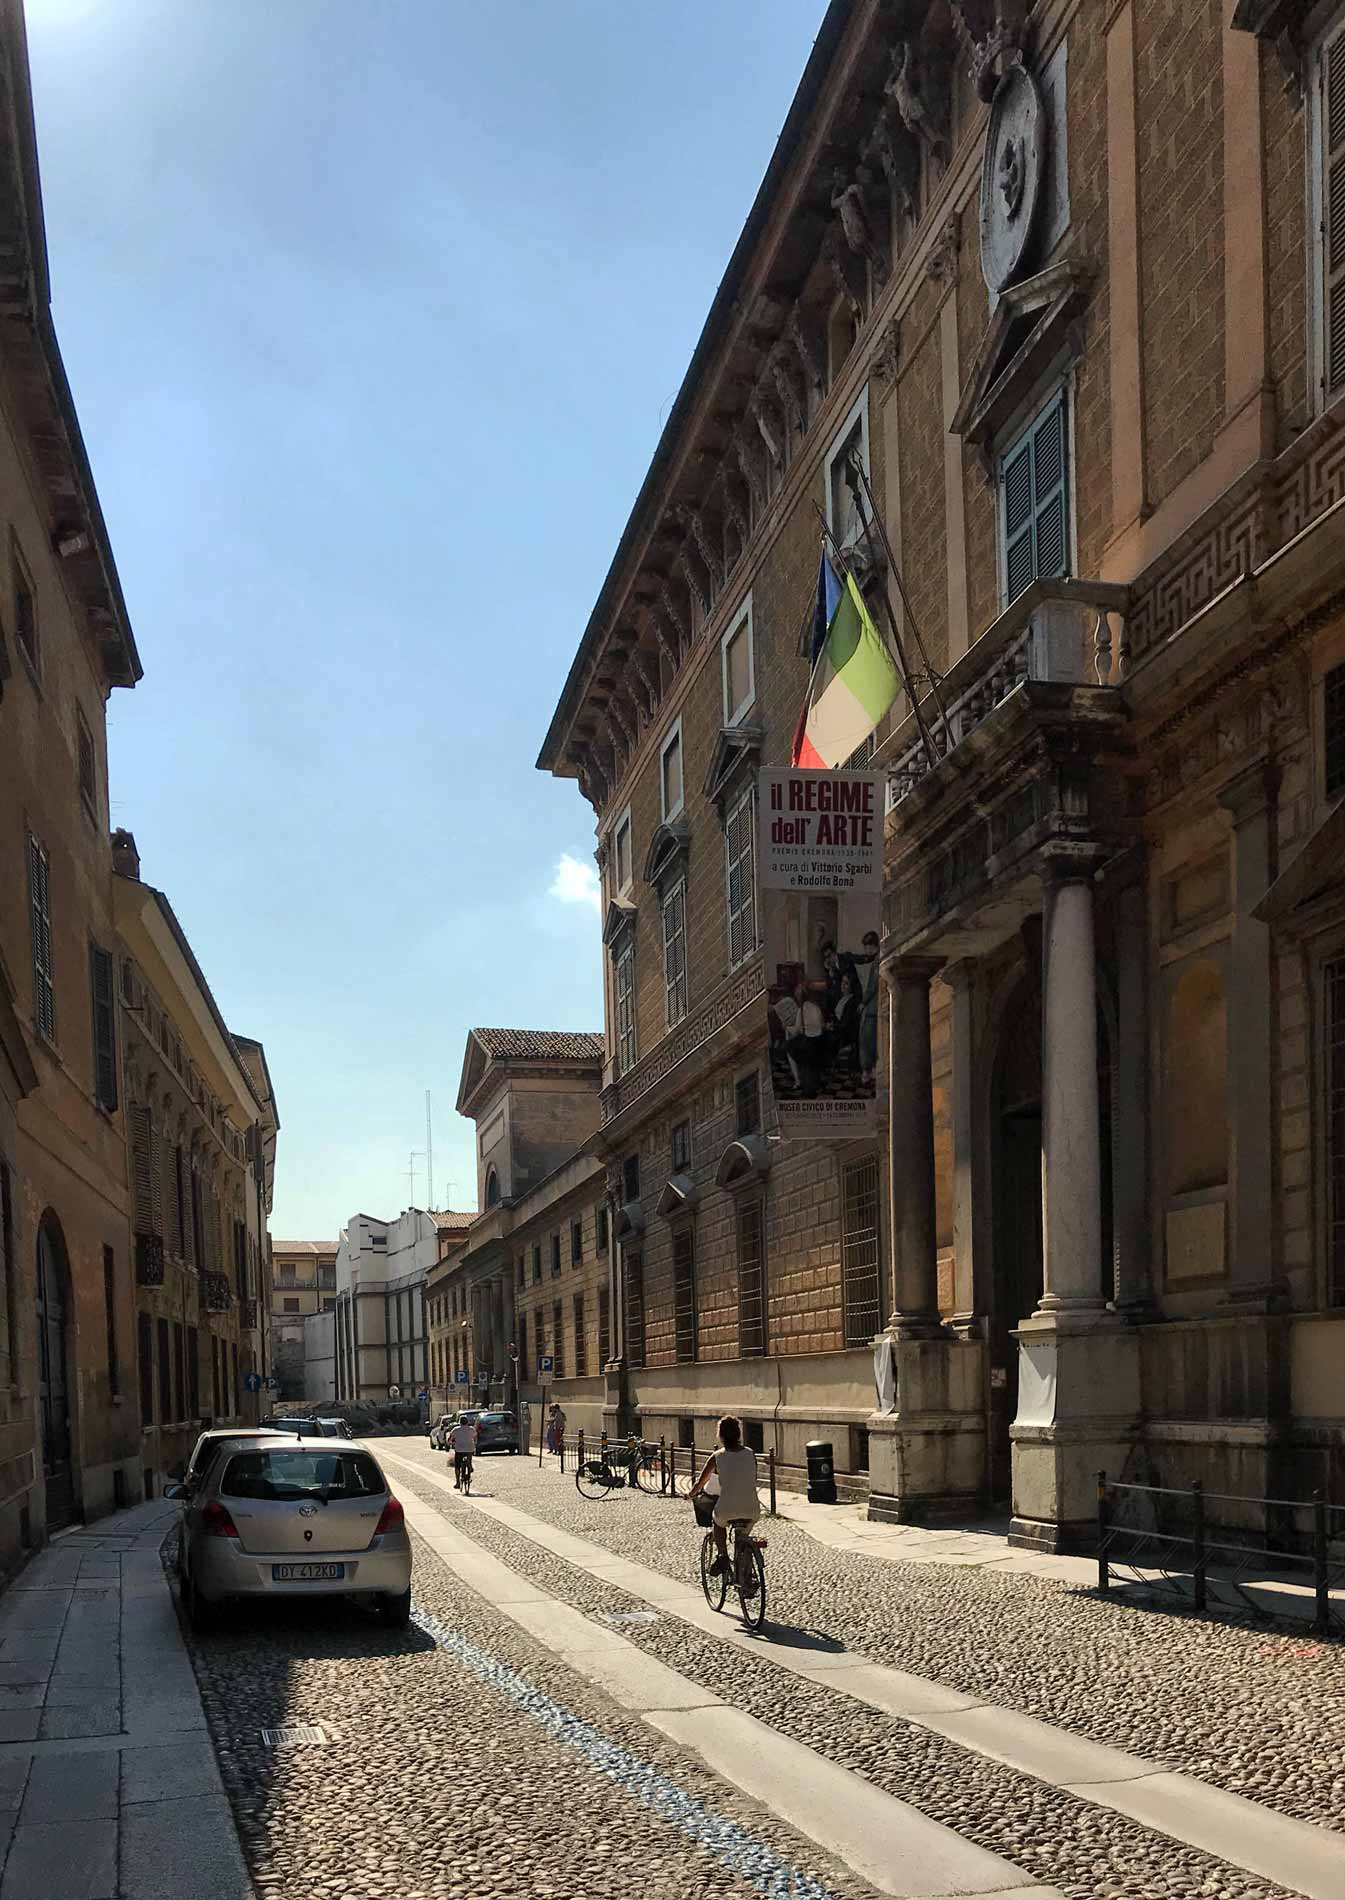 Museo-civico-ala-ponzone-cremona-via-ugulani-dati-palatto-affaitati